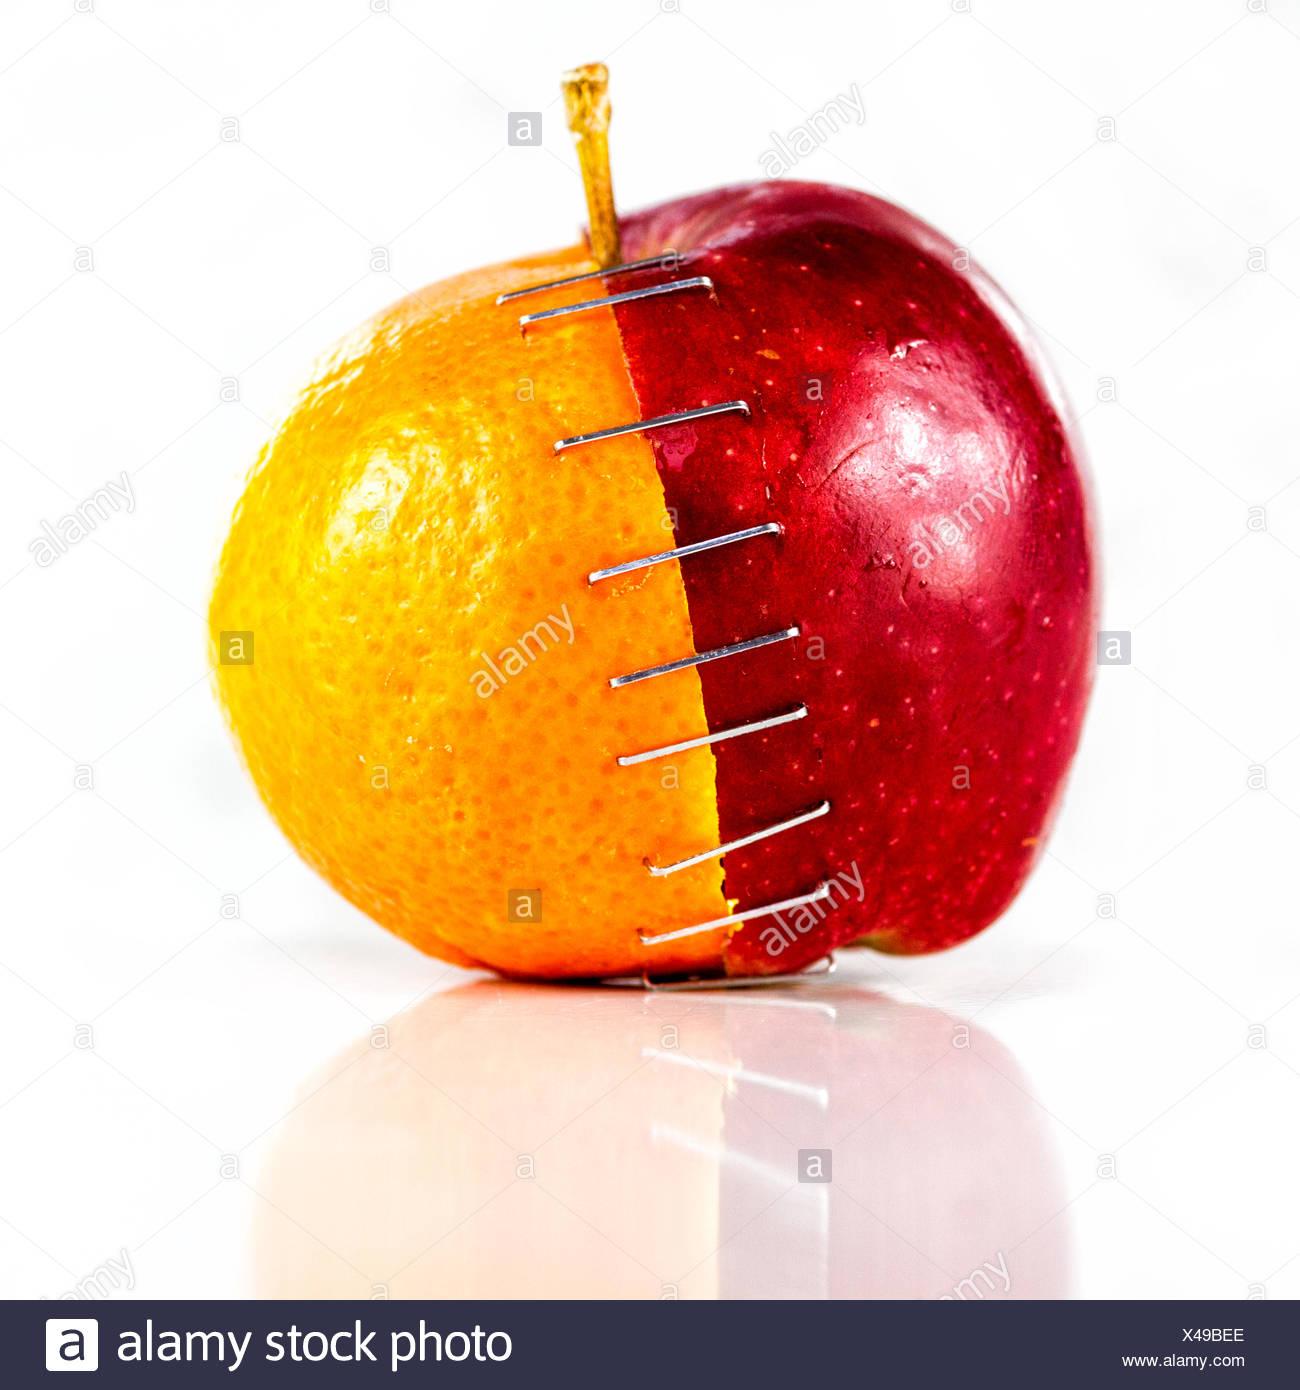 Apple e orange pinzati insieme Immagini Stock